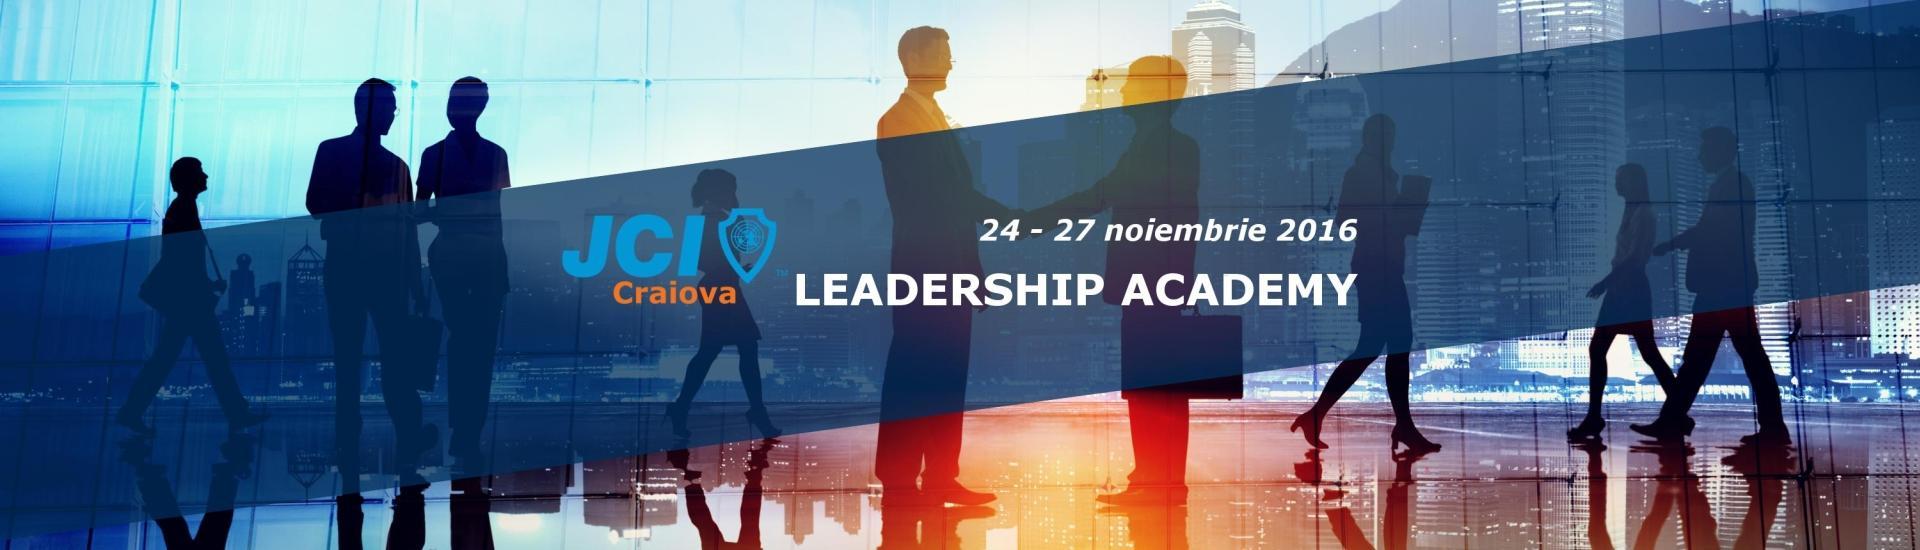 leadership-academy-craiova2016